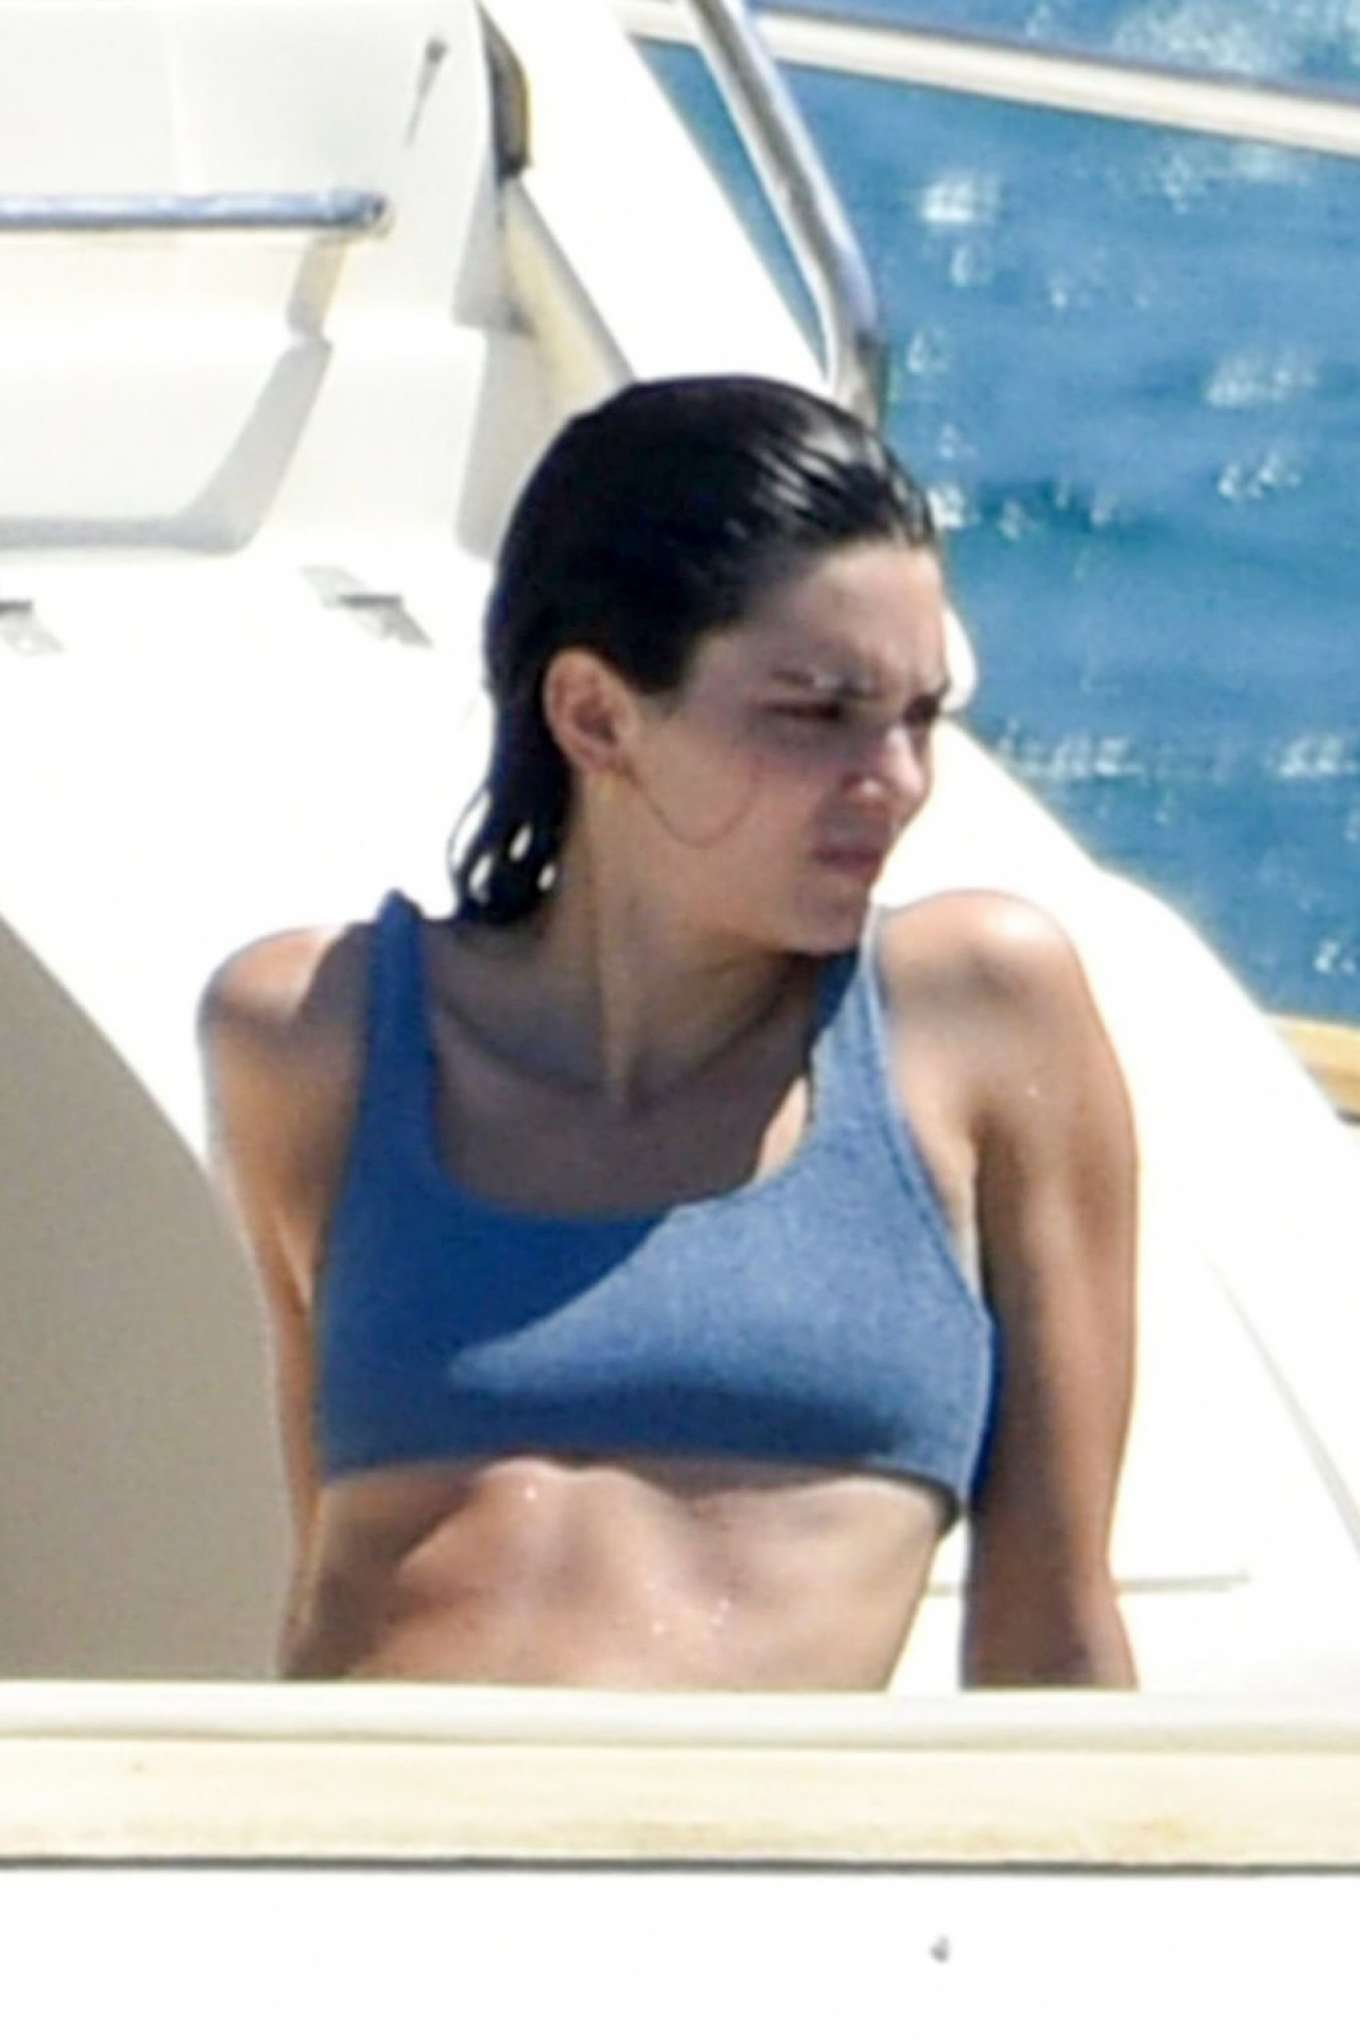 Kendall Jenner 2019 : Kendall Jenner in Blue Bikini 2019-03